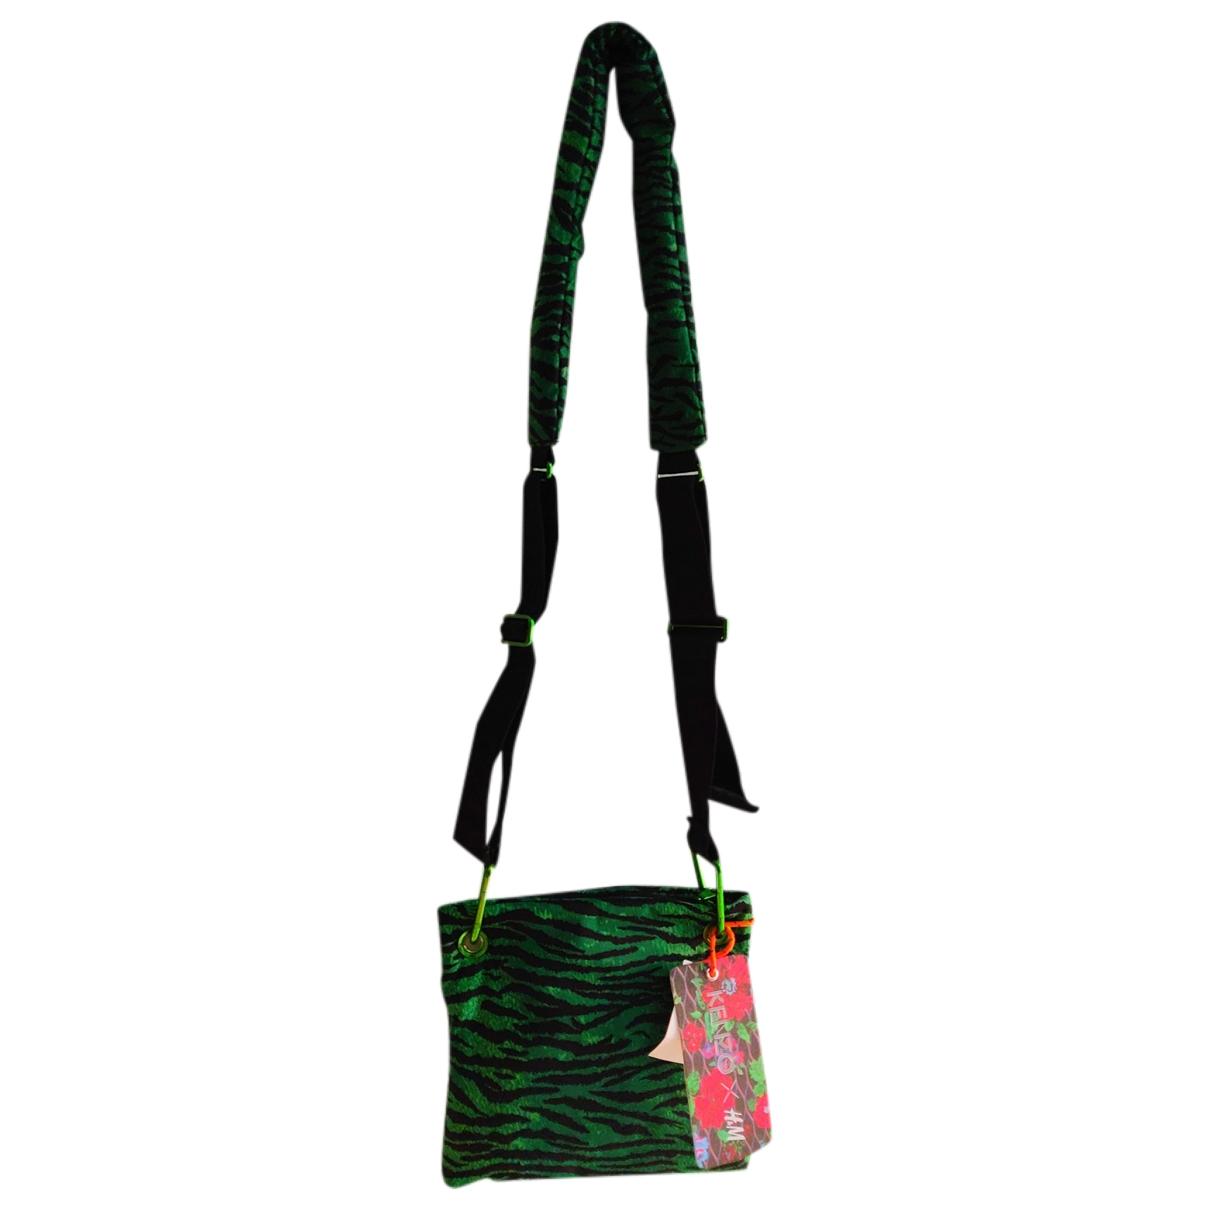 Kenzo X H&m - Pochette   pour femme - vert